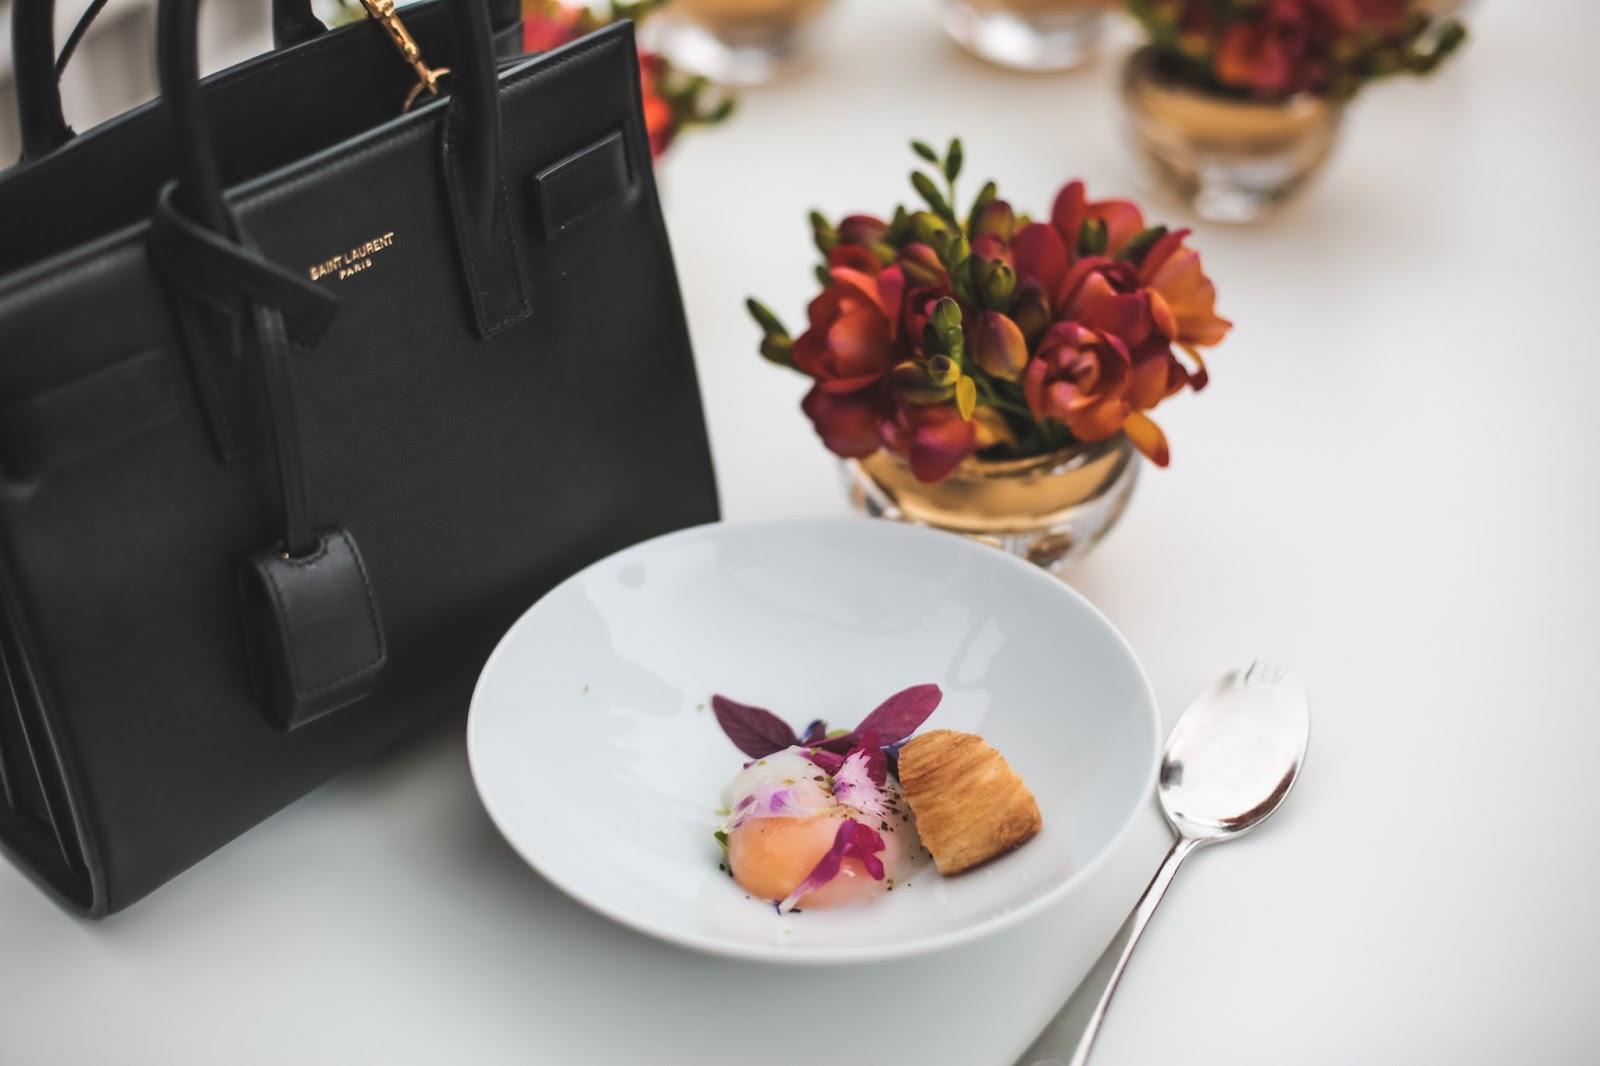 potel & chabot petit déjeuner roland garros 2017